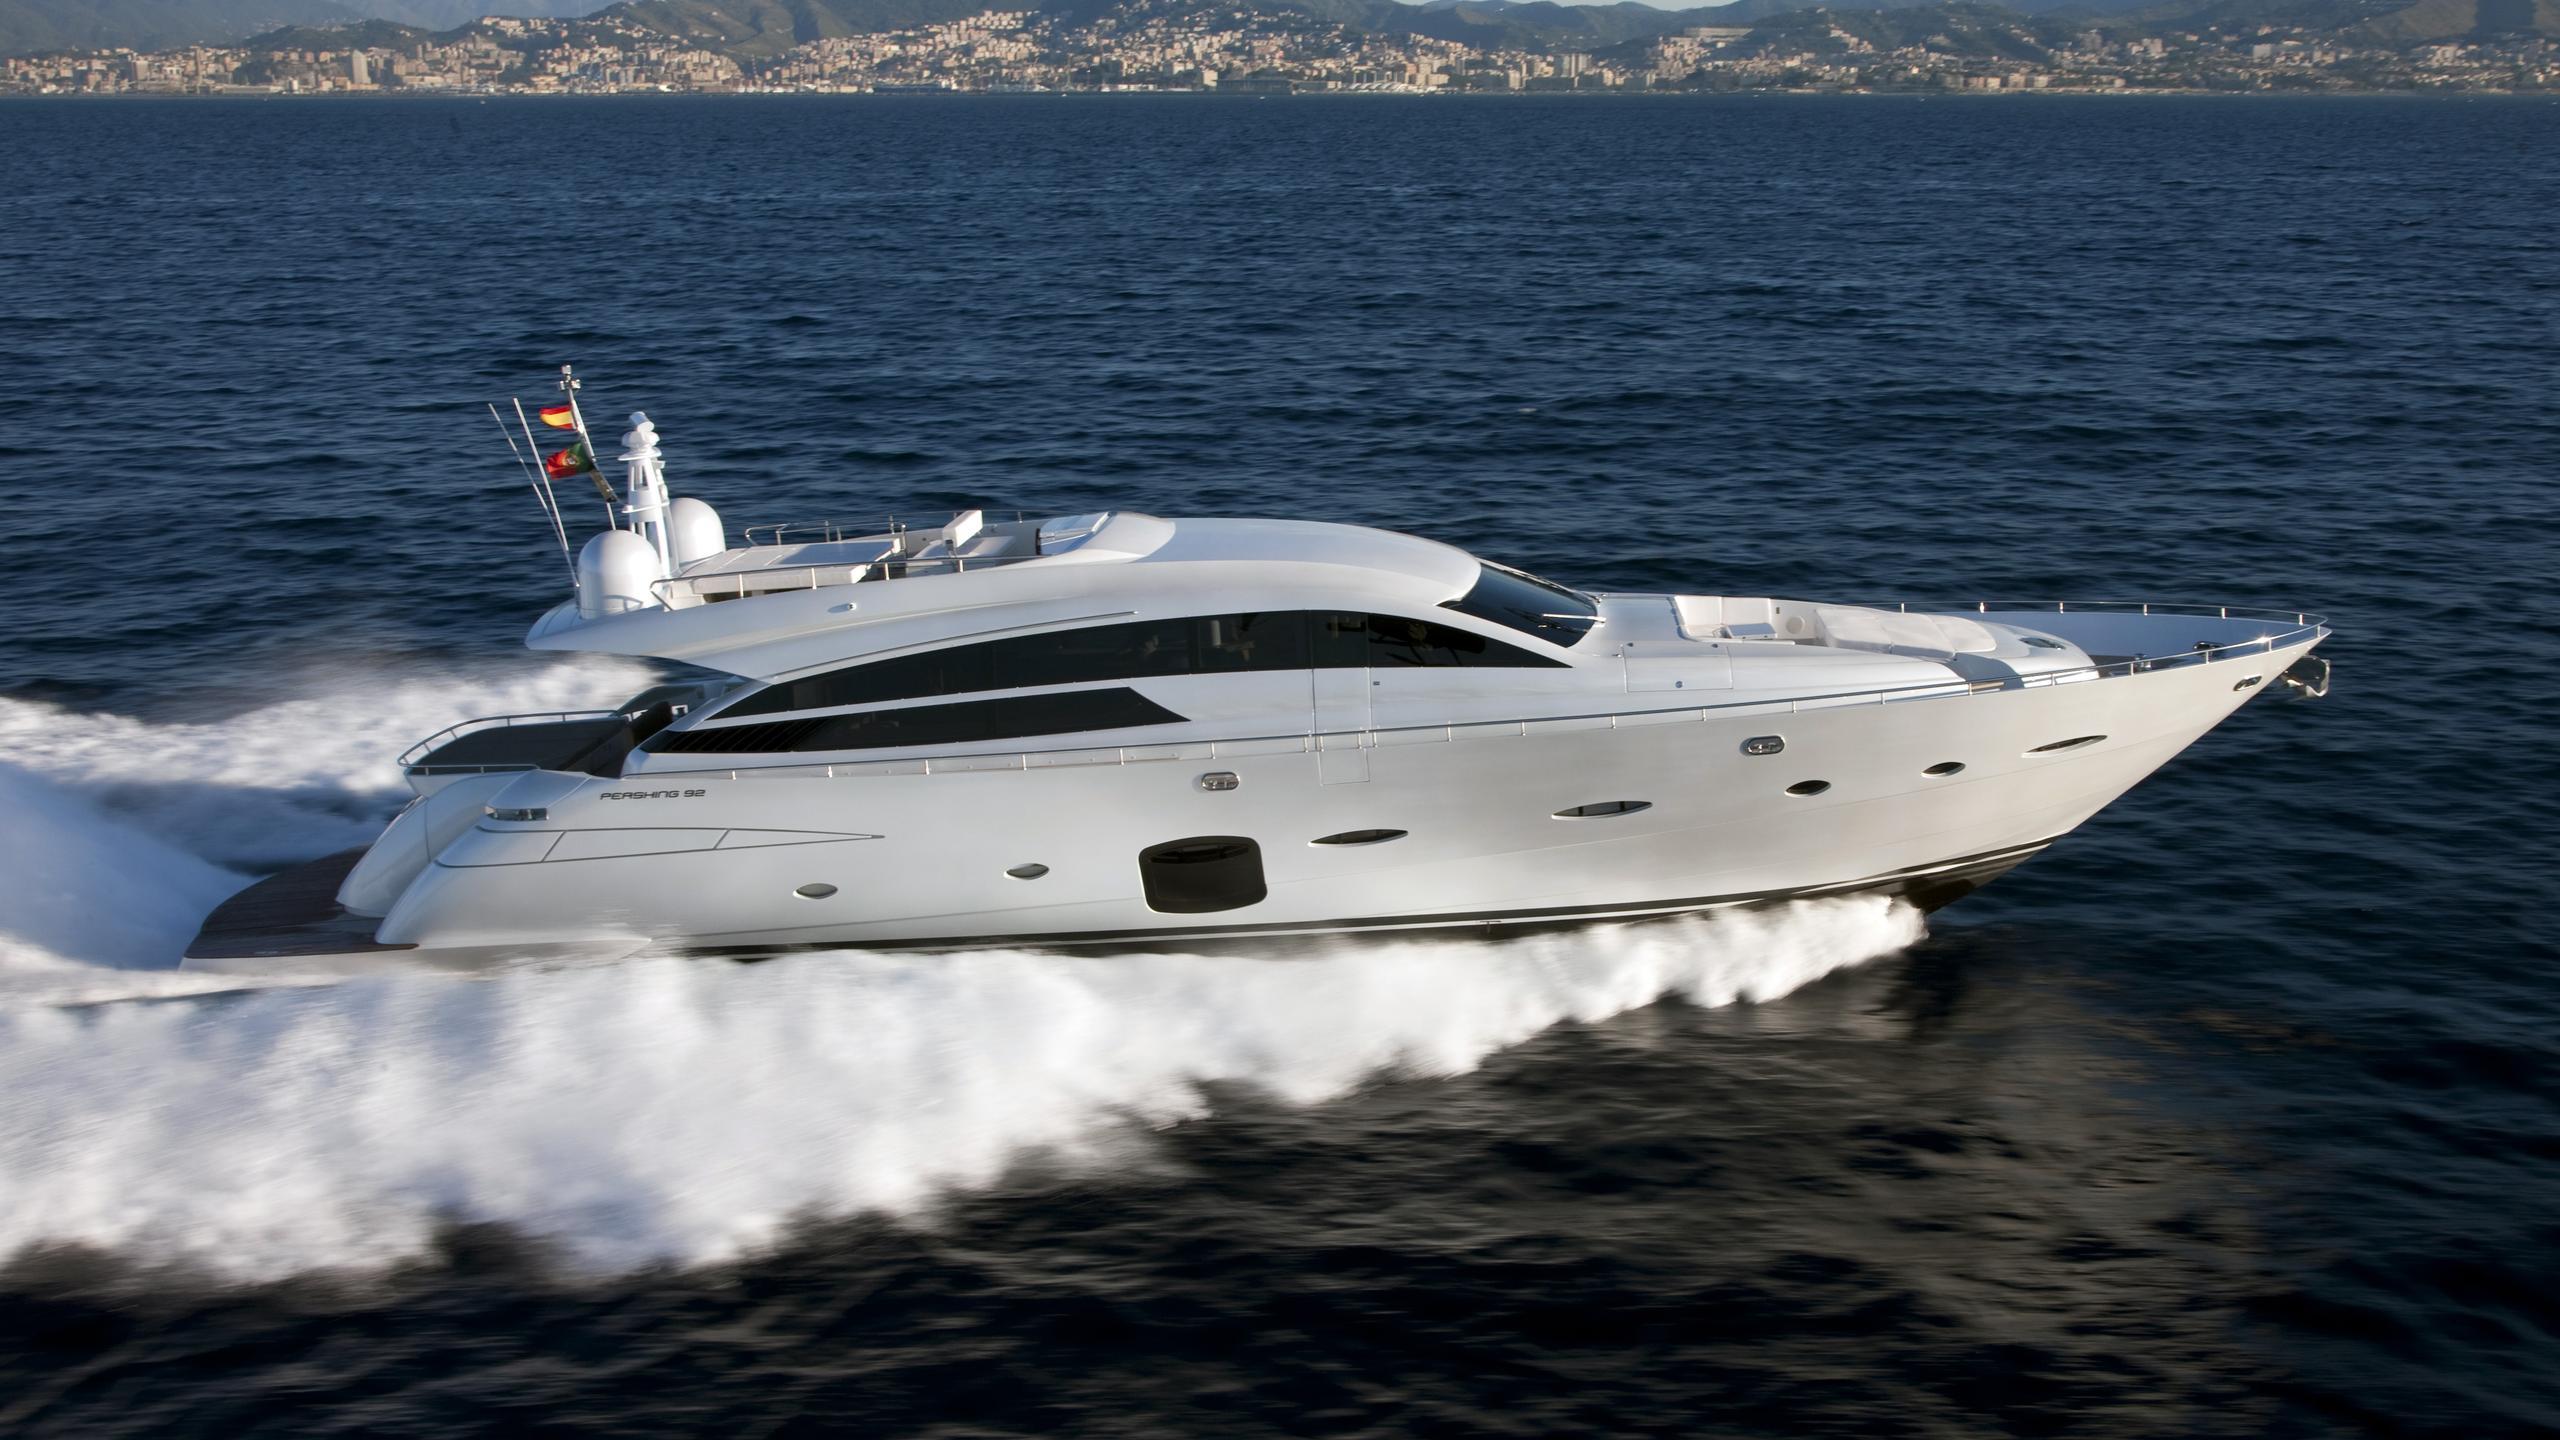 doris-motor-yacht-pershing-92-2012-28m-cruising-sistership